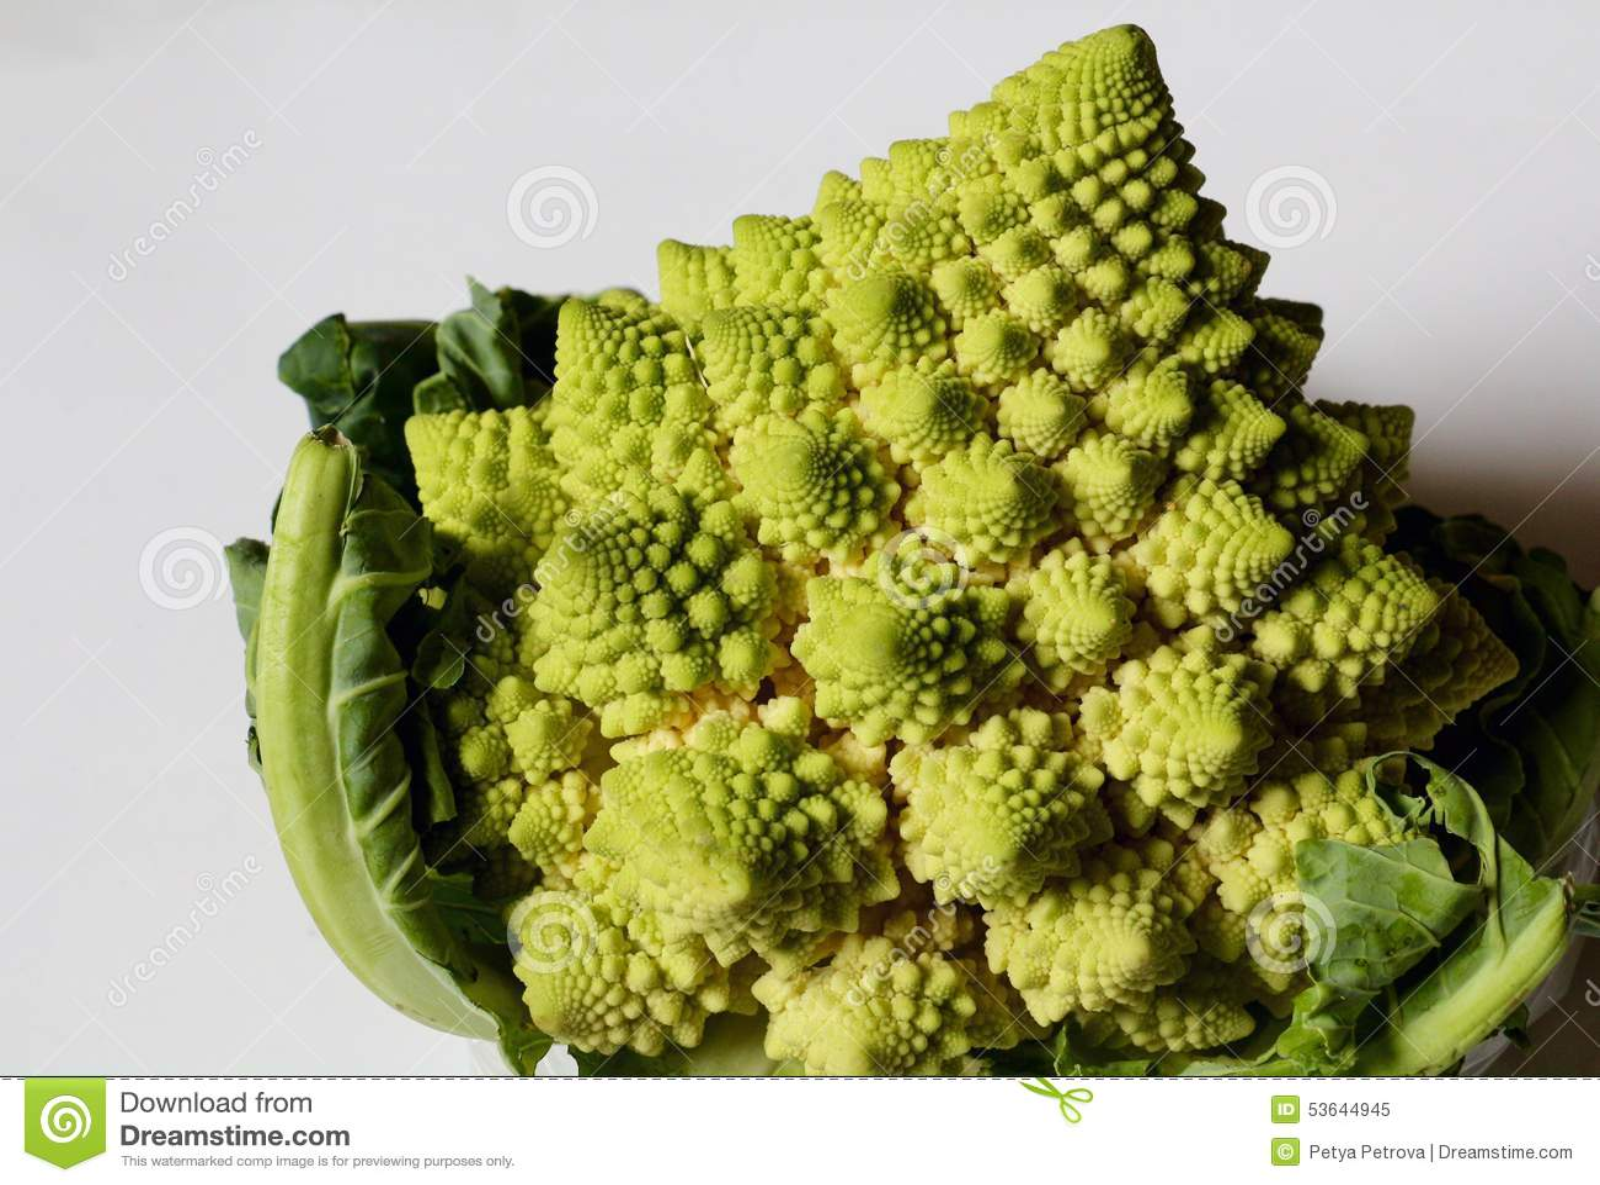 Cauliflower Romanesco Broccoli Plant Stock Image Image Of Light